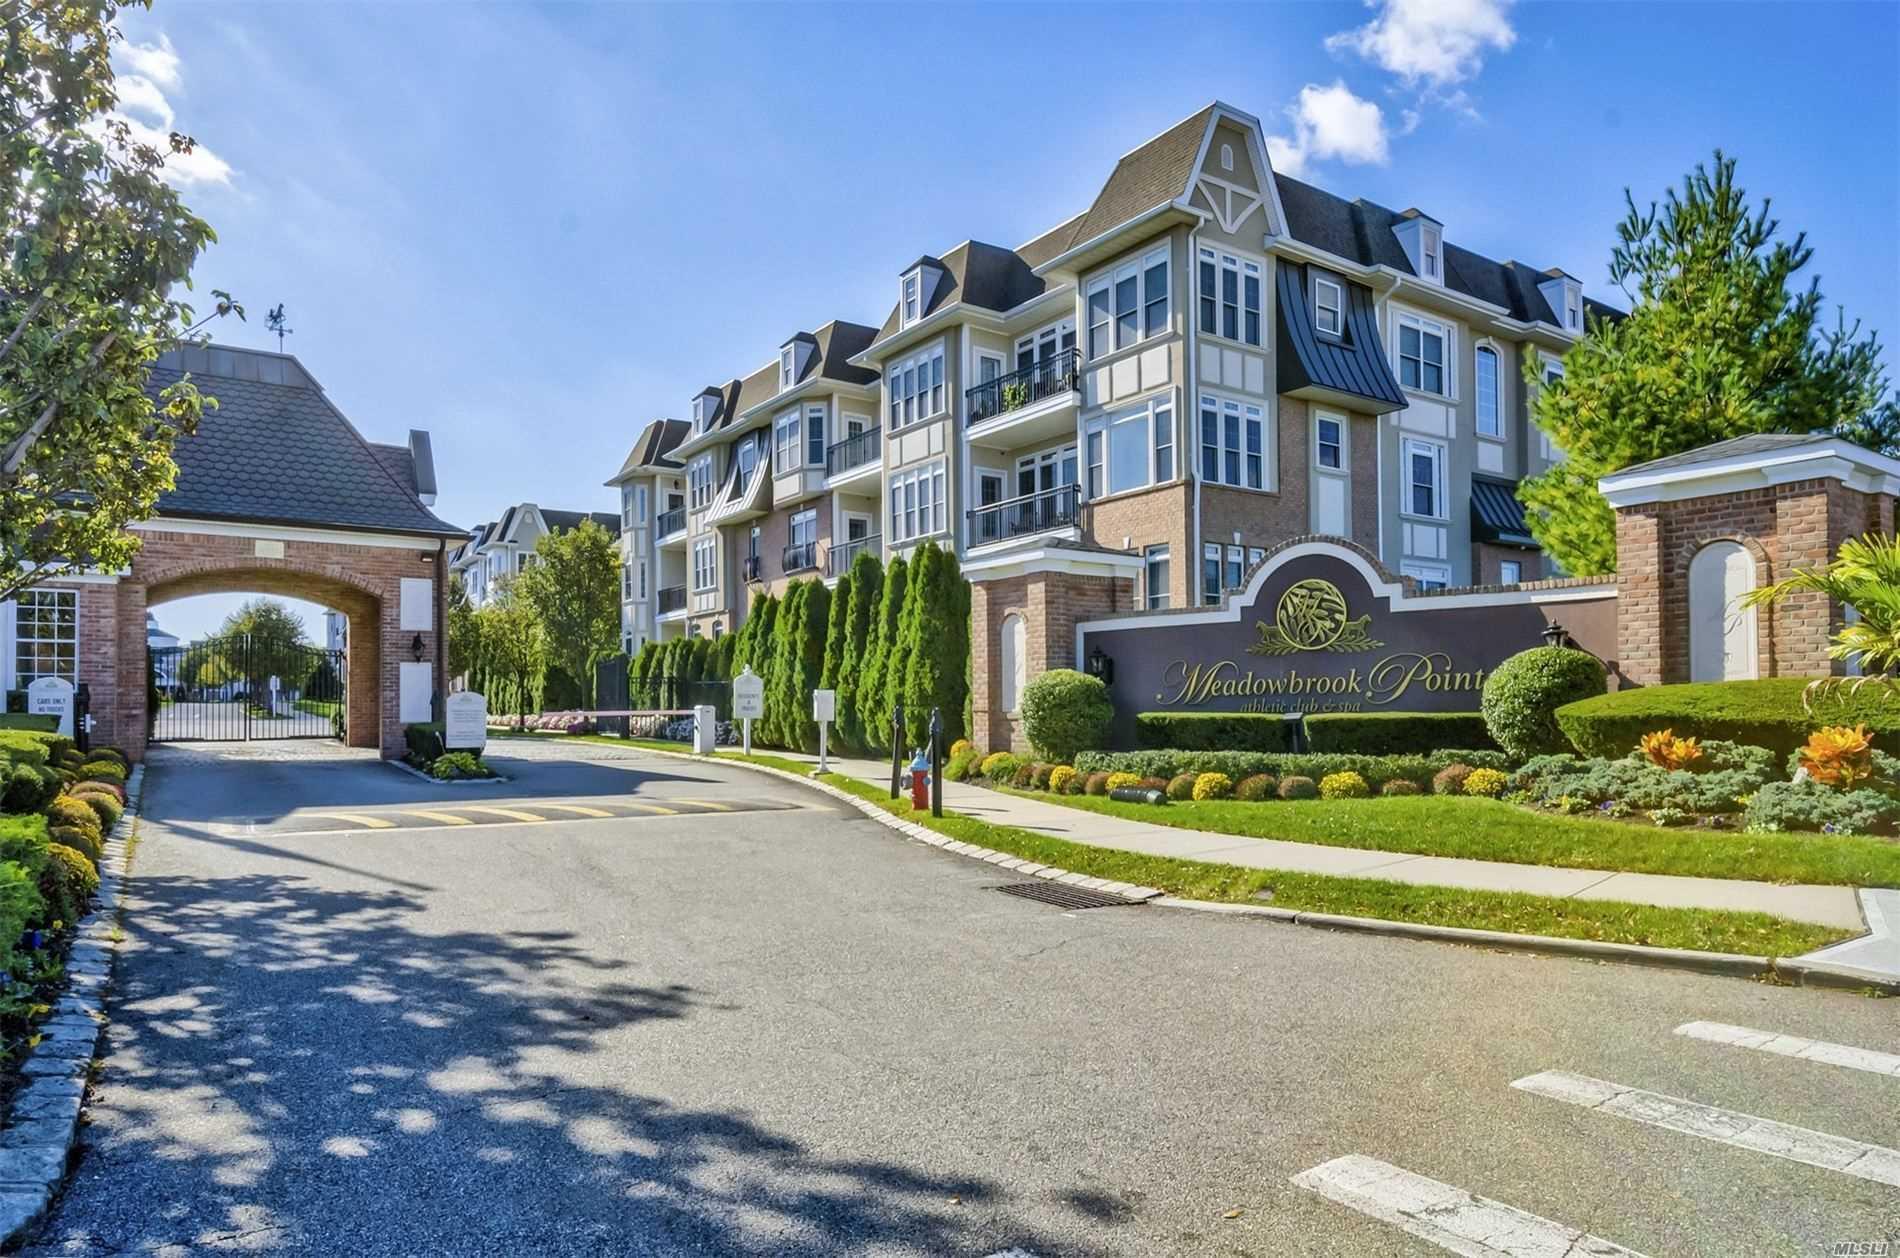 Property for sale at 510 Pacing Way, Westbury NY 11590, Westbury,  New York 11590